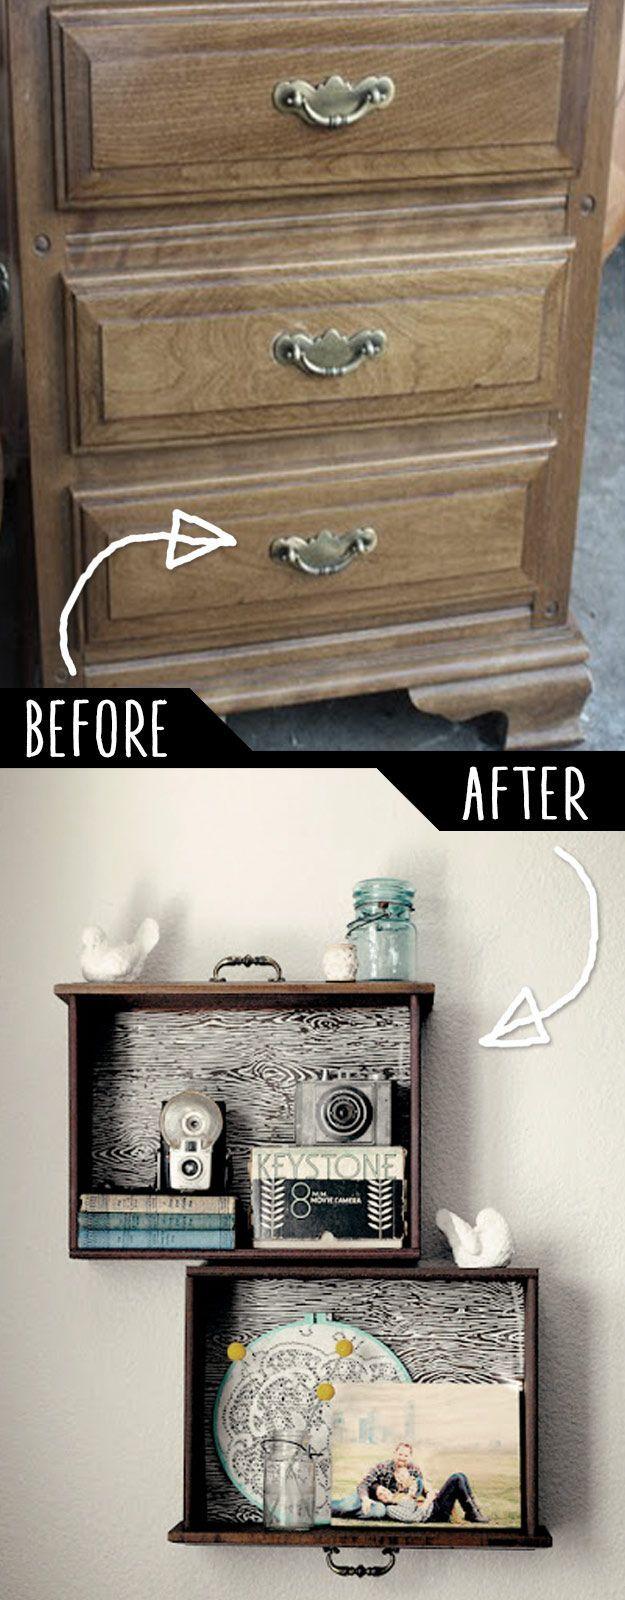 25 best ideas about Diy bedroom decor on Pinterest  Kids bedroom diy girls Bed room and Diy